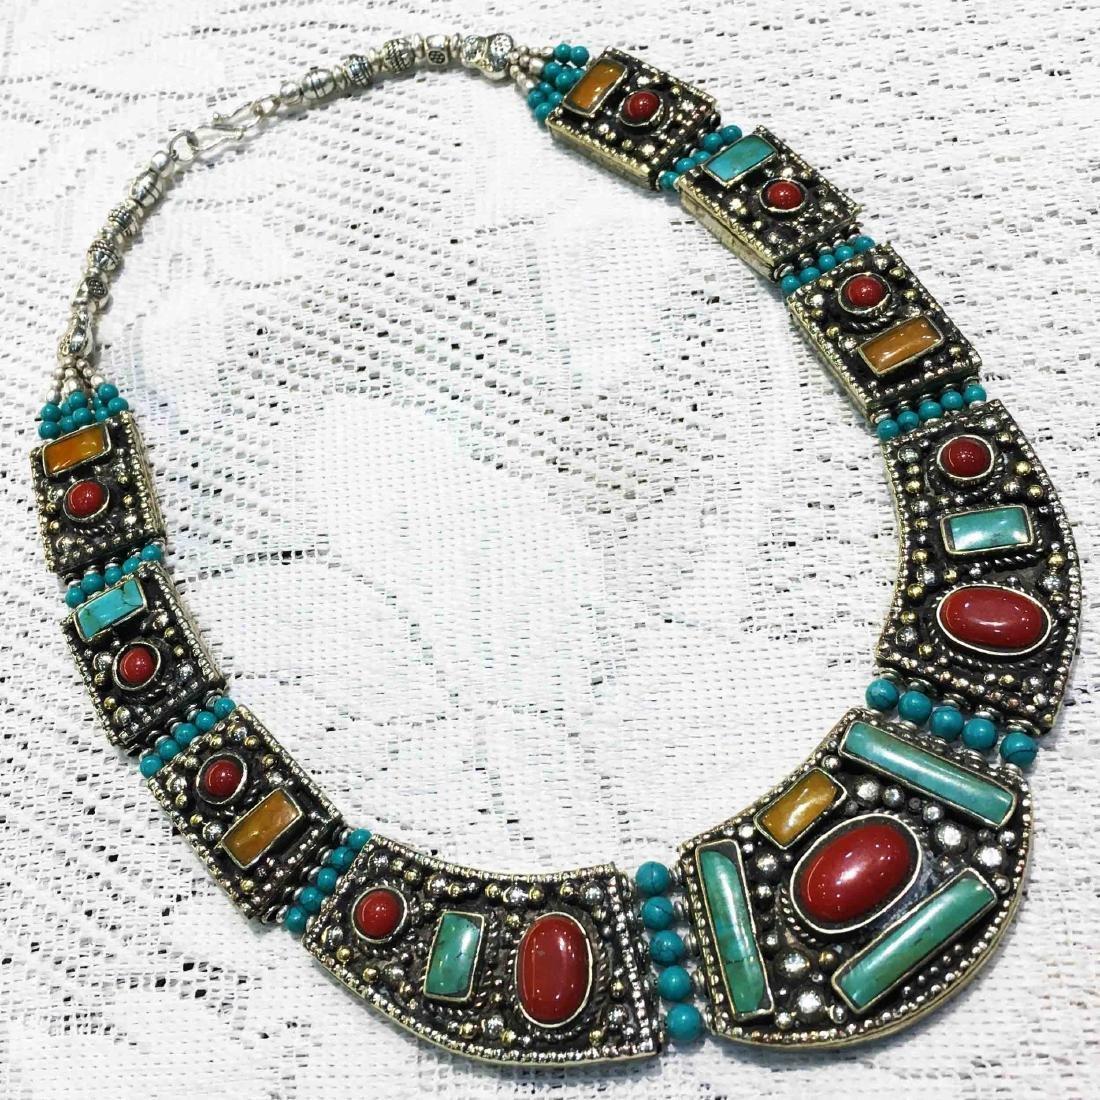 Buddhist Vintage Tibetan Nepali Necklace